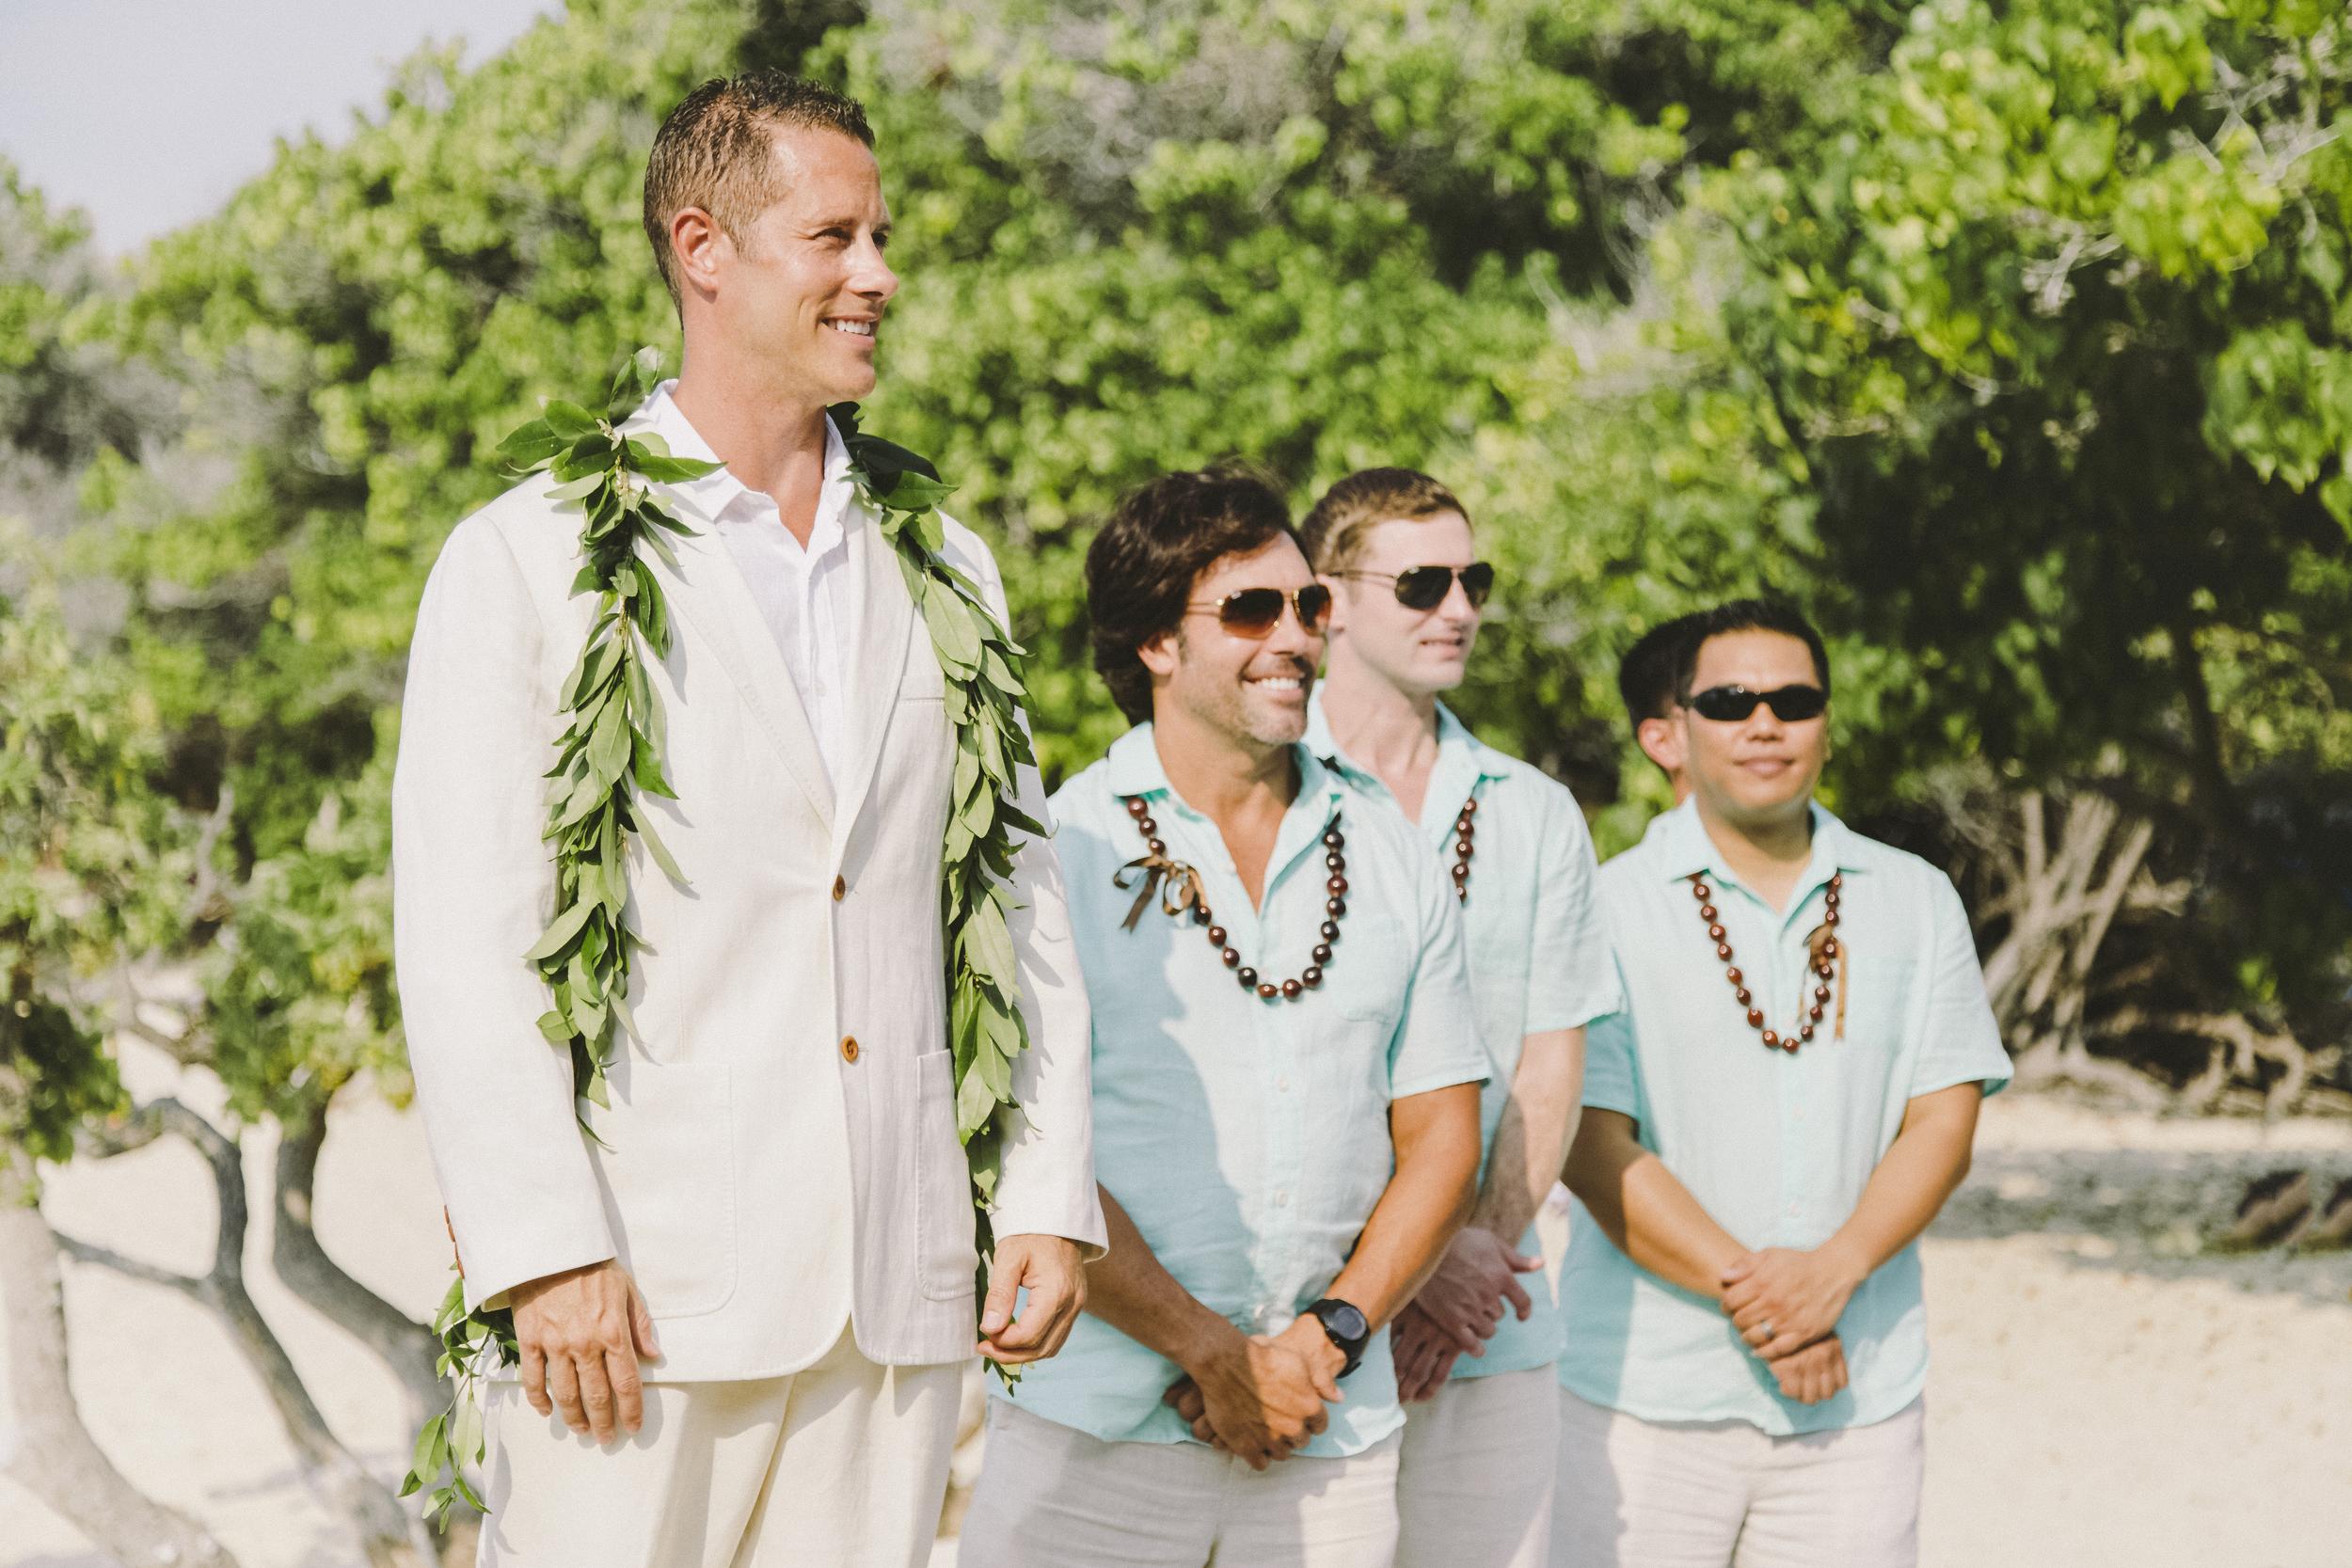 angie-diaz-photography-hawaii-wedding-photographer-kelli-jay-53.jpg